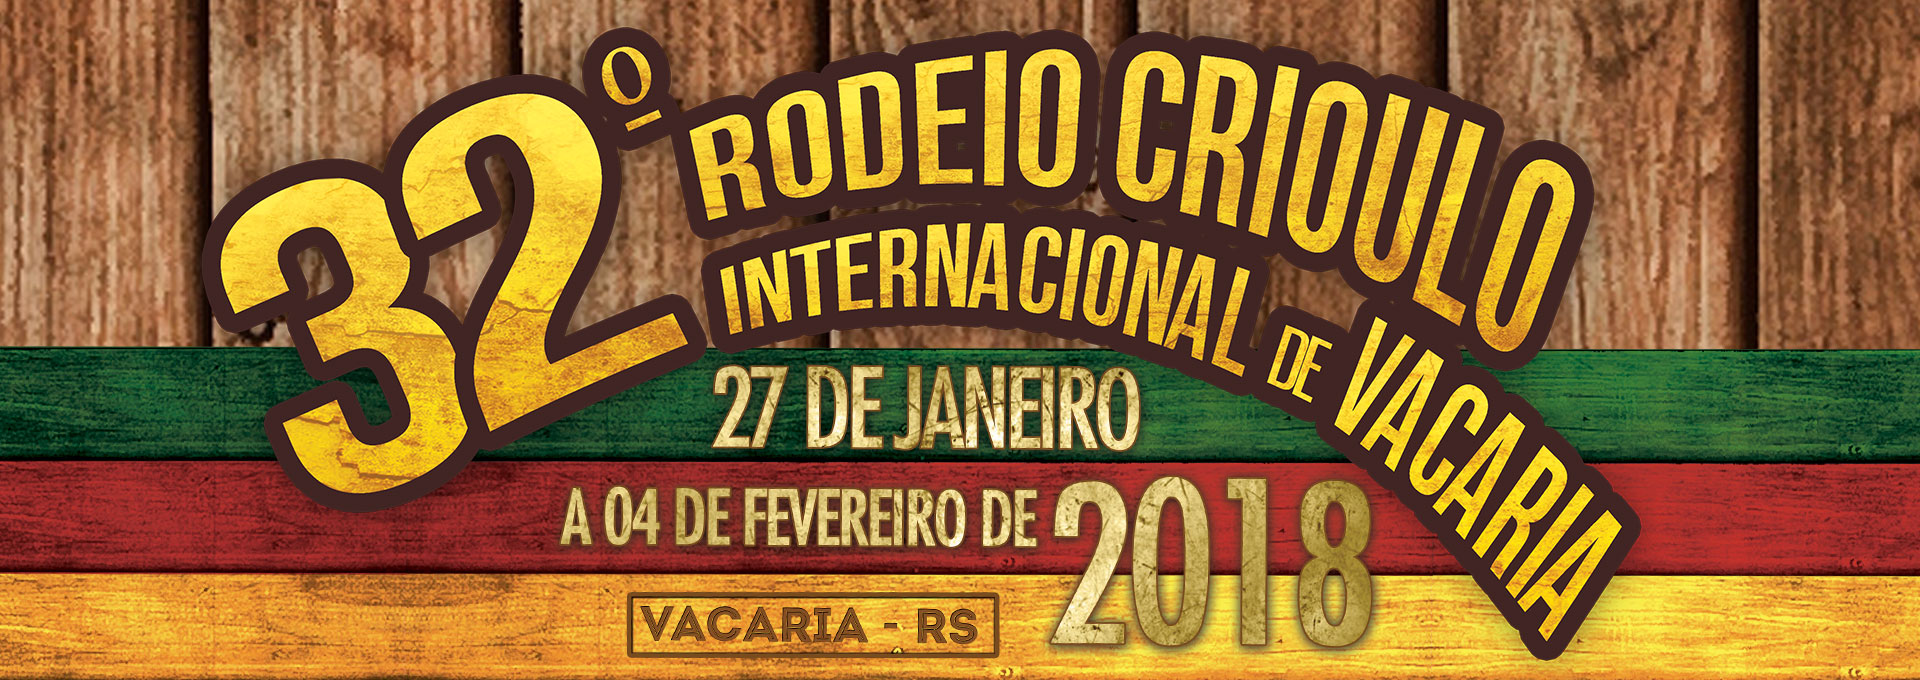 slide-rodeio